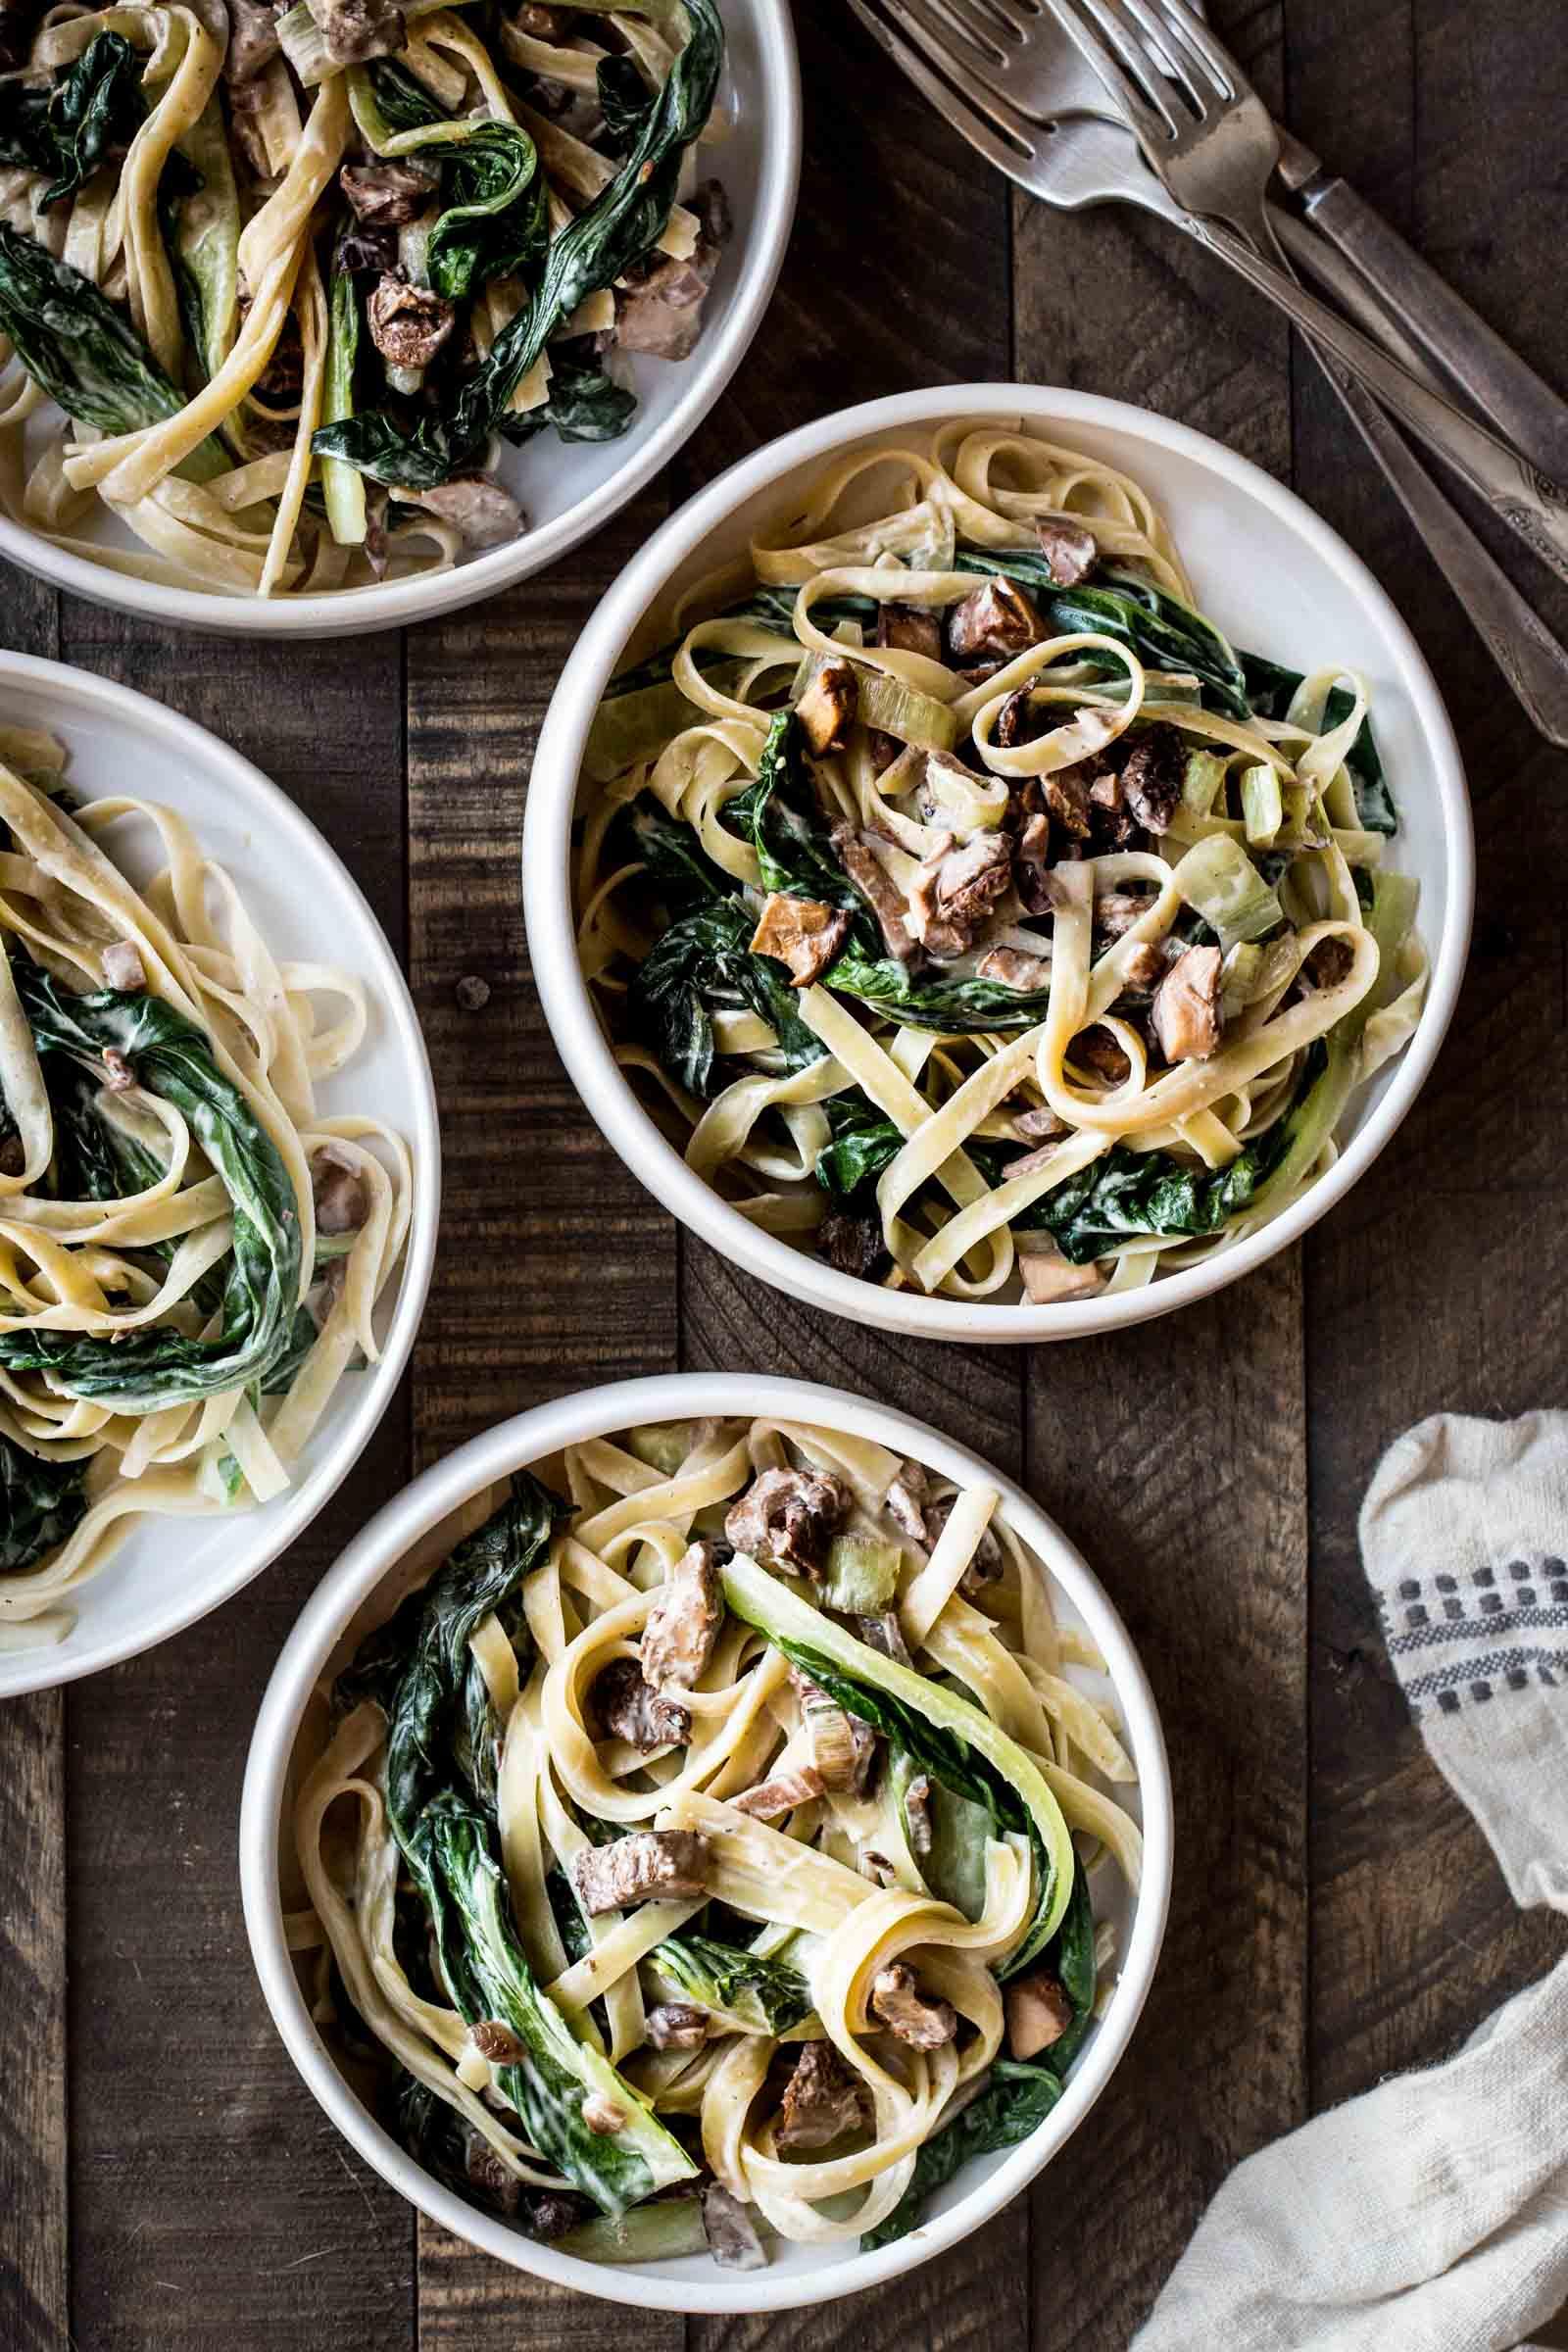 Wild Mushroom & Bok Choy Pasta with Miso Sauce